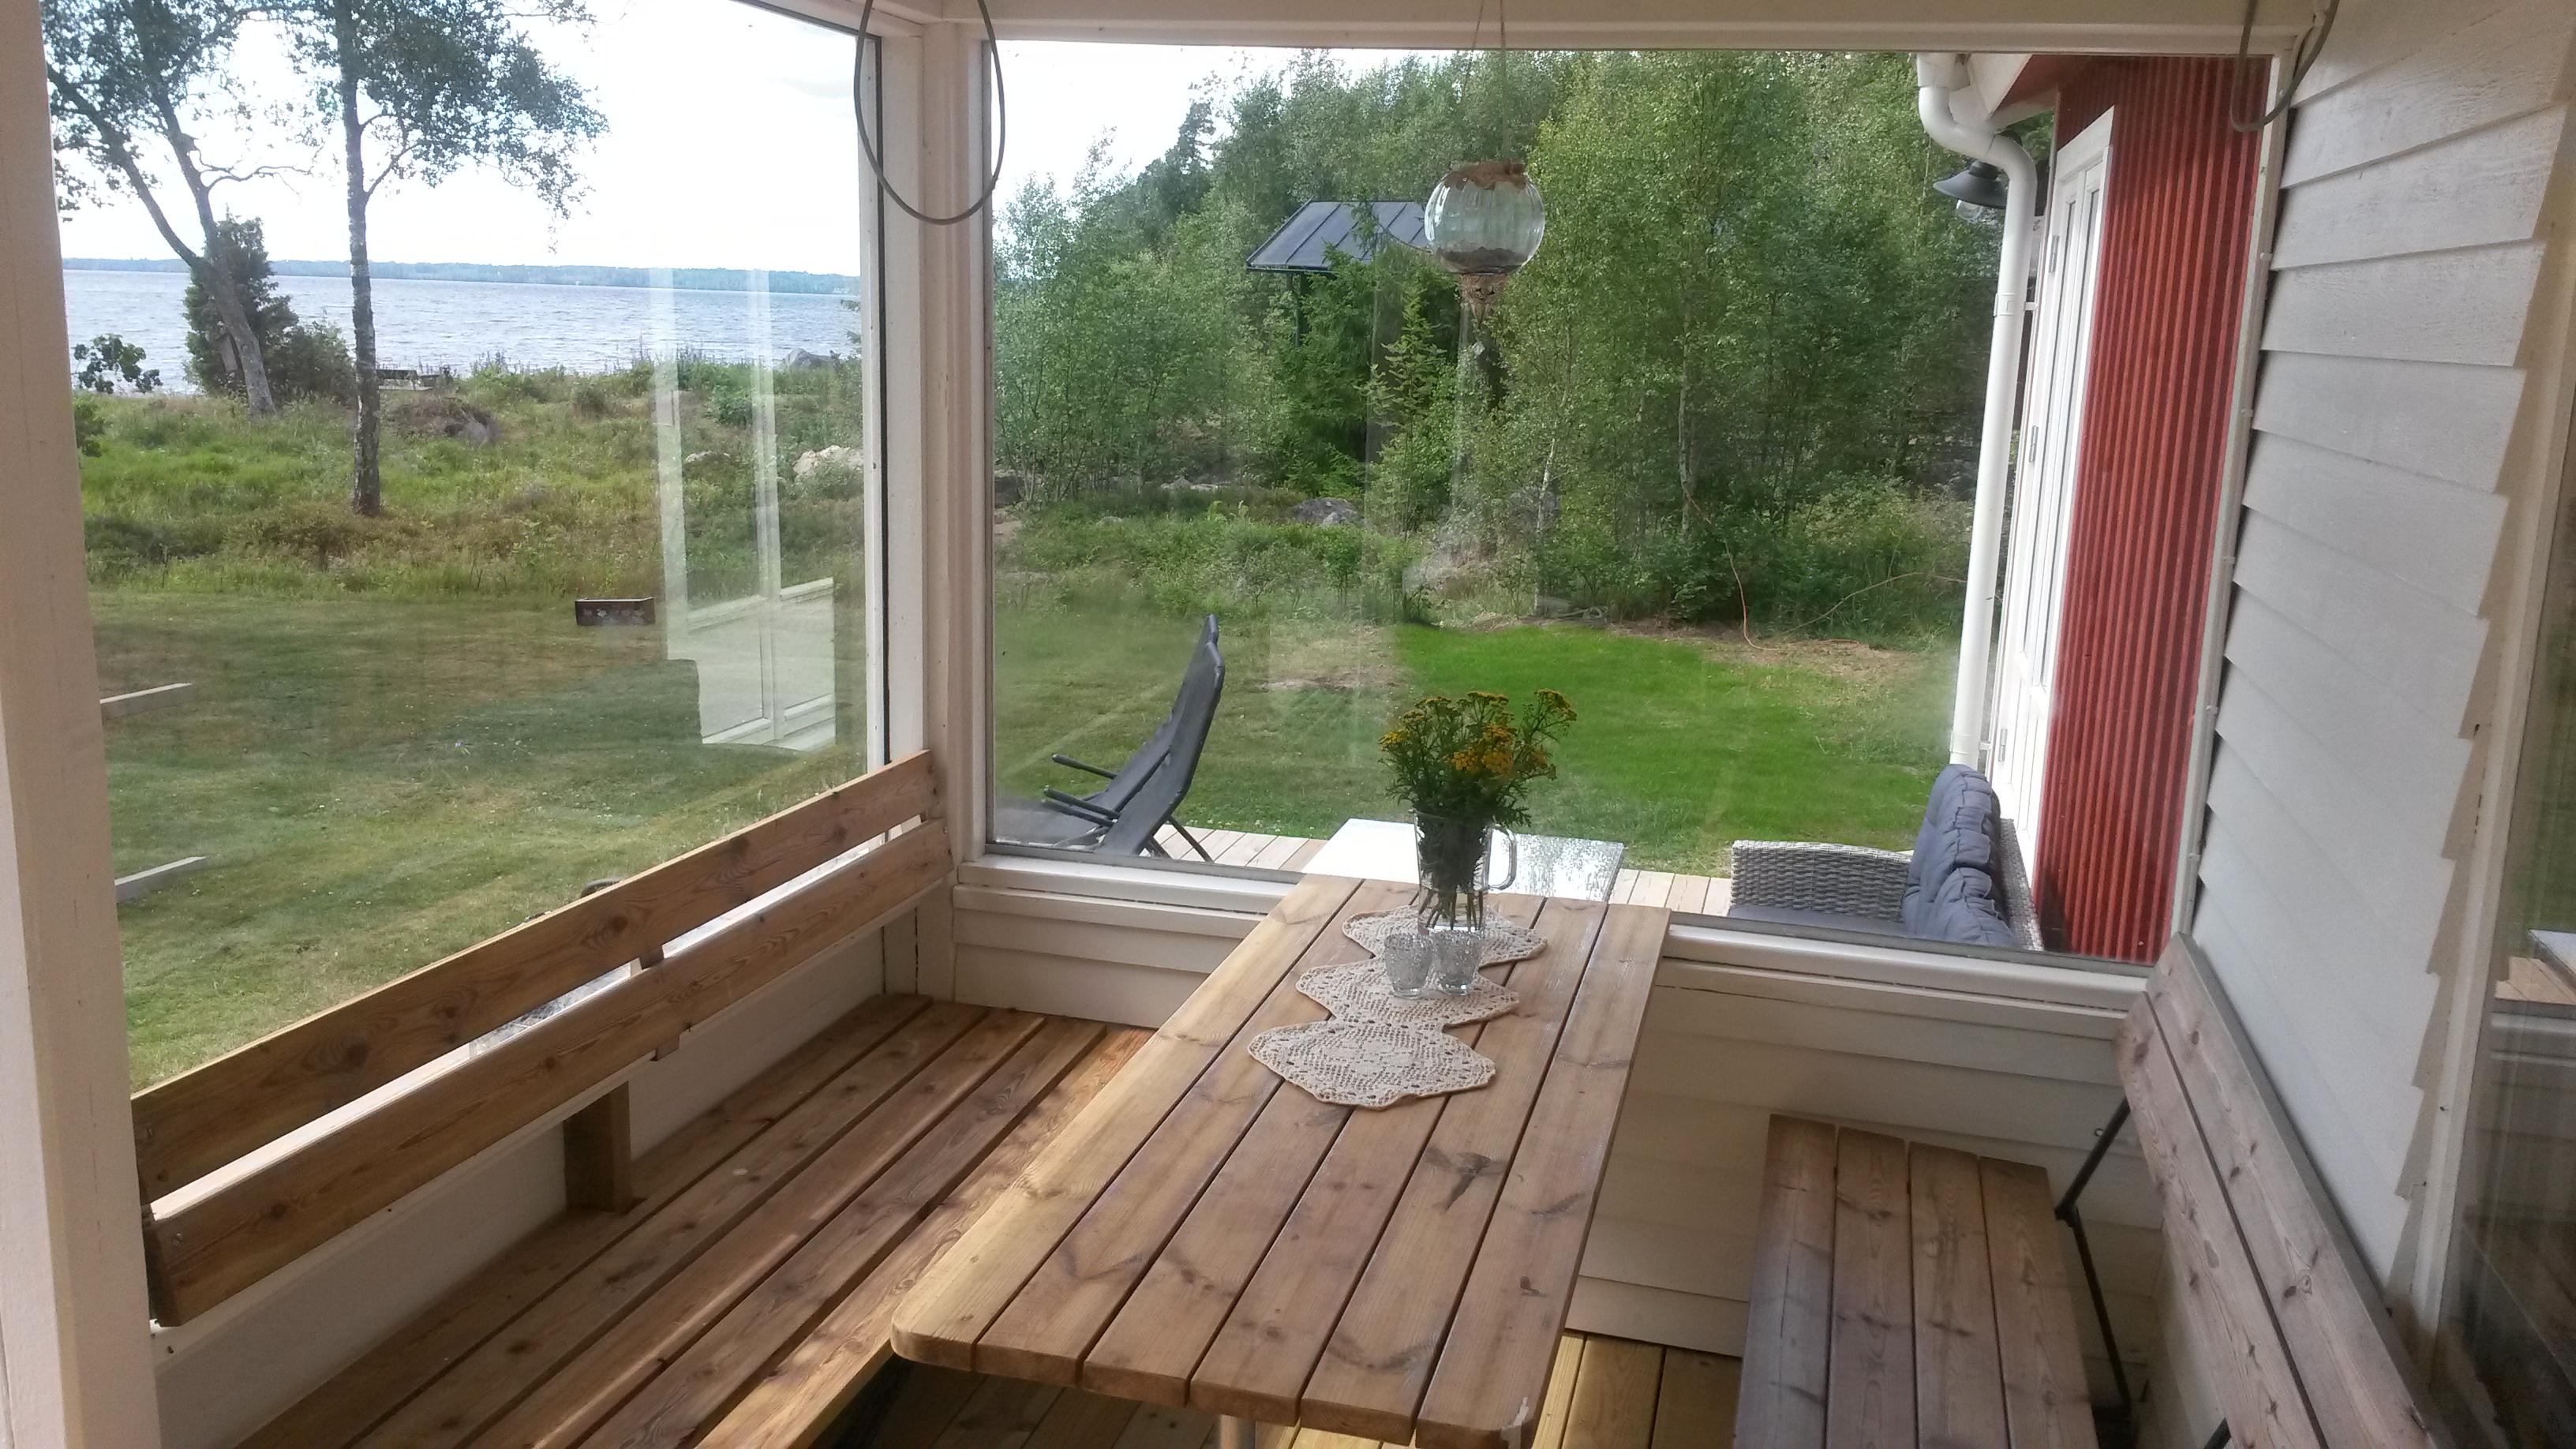 Gratis varor i Nottebck, Kronobergs Ln, Sweden | Facebook